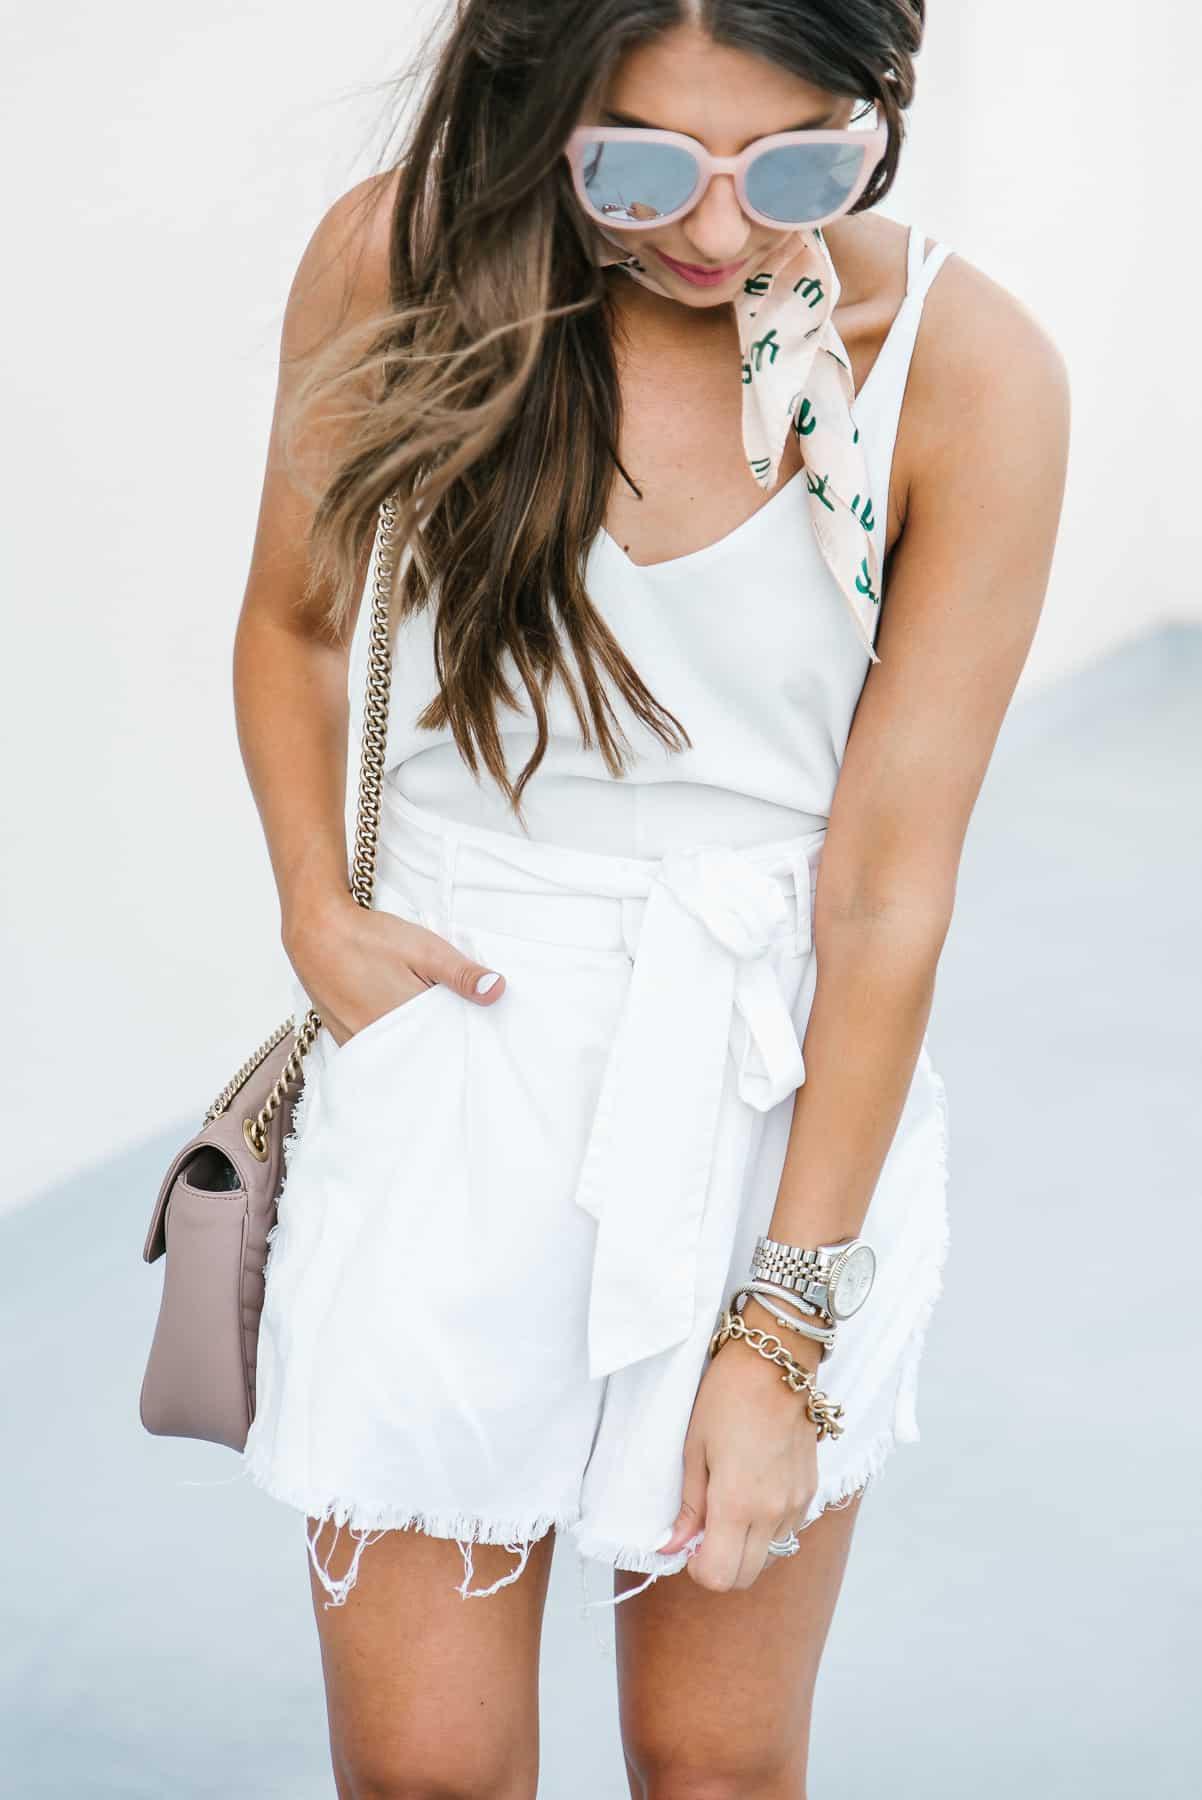 Dress Up ButterCup, Fashion Blogger, Houston Blogger, Dede Raad, Neck Tie, Cactus, Summer